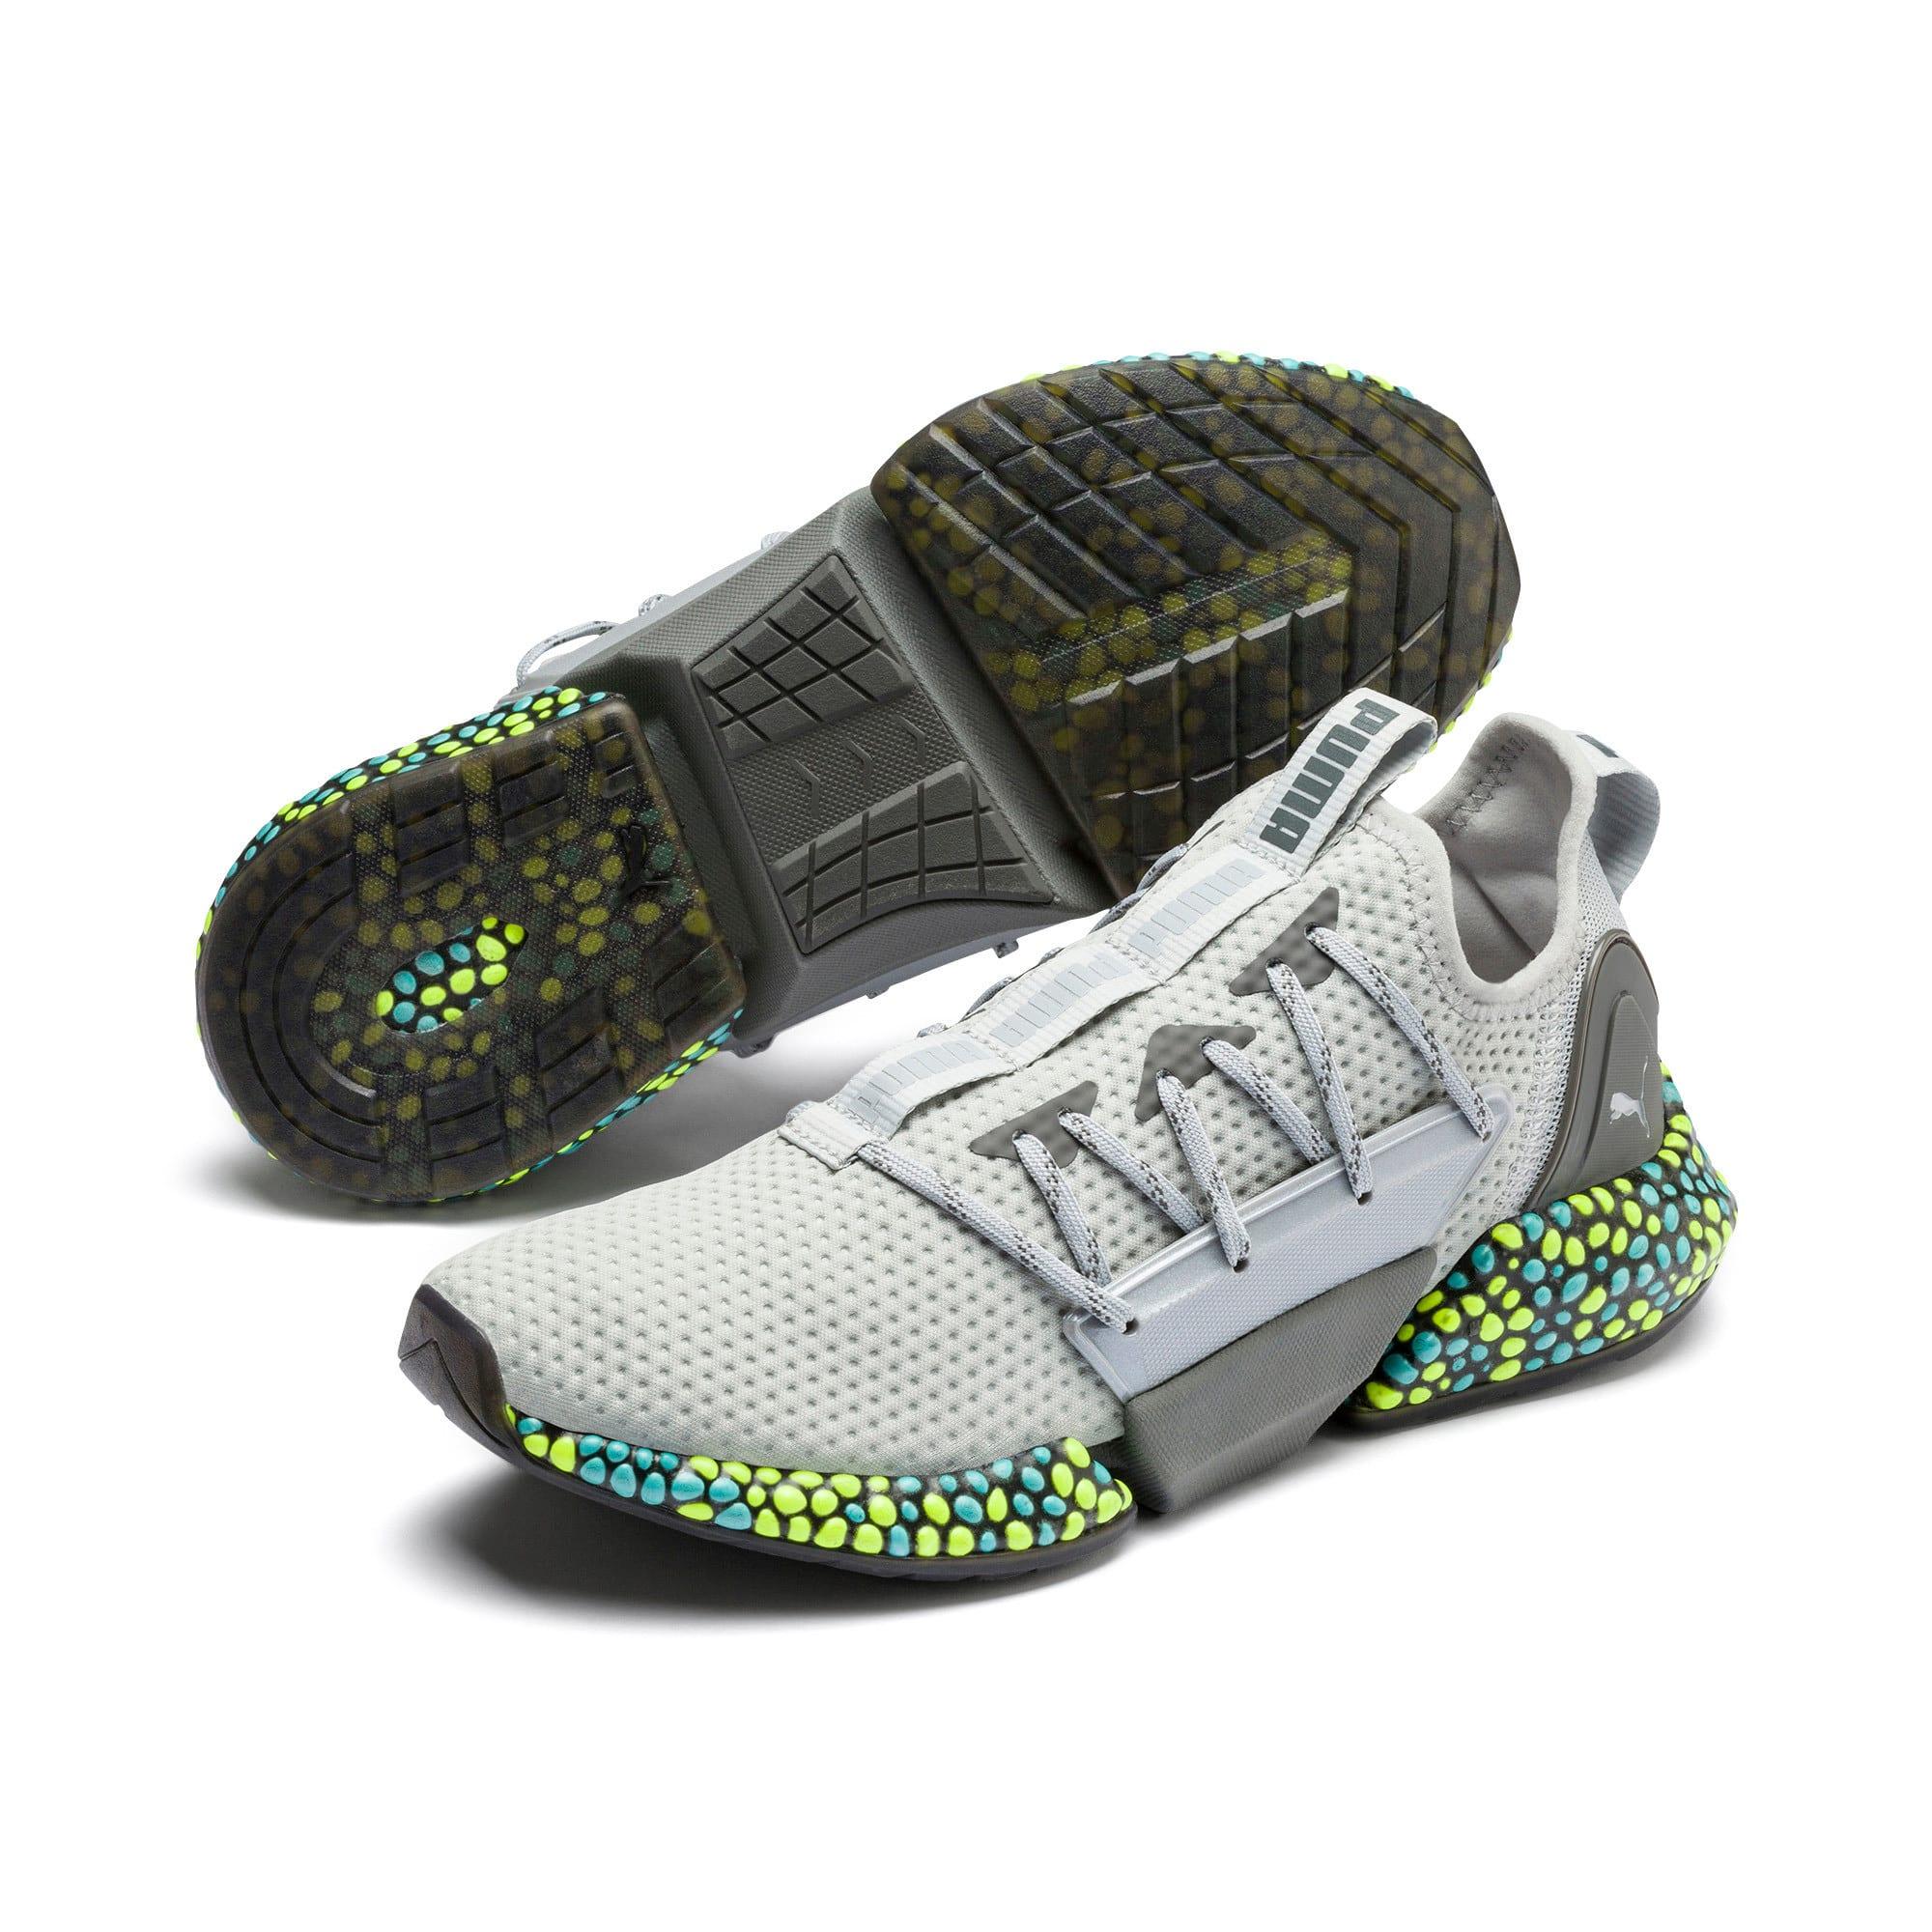 Thumbnail 2 of HYBRID Rocket Aero Men's Running Shoes, High Rise-CASTLEROCK, medium